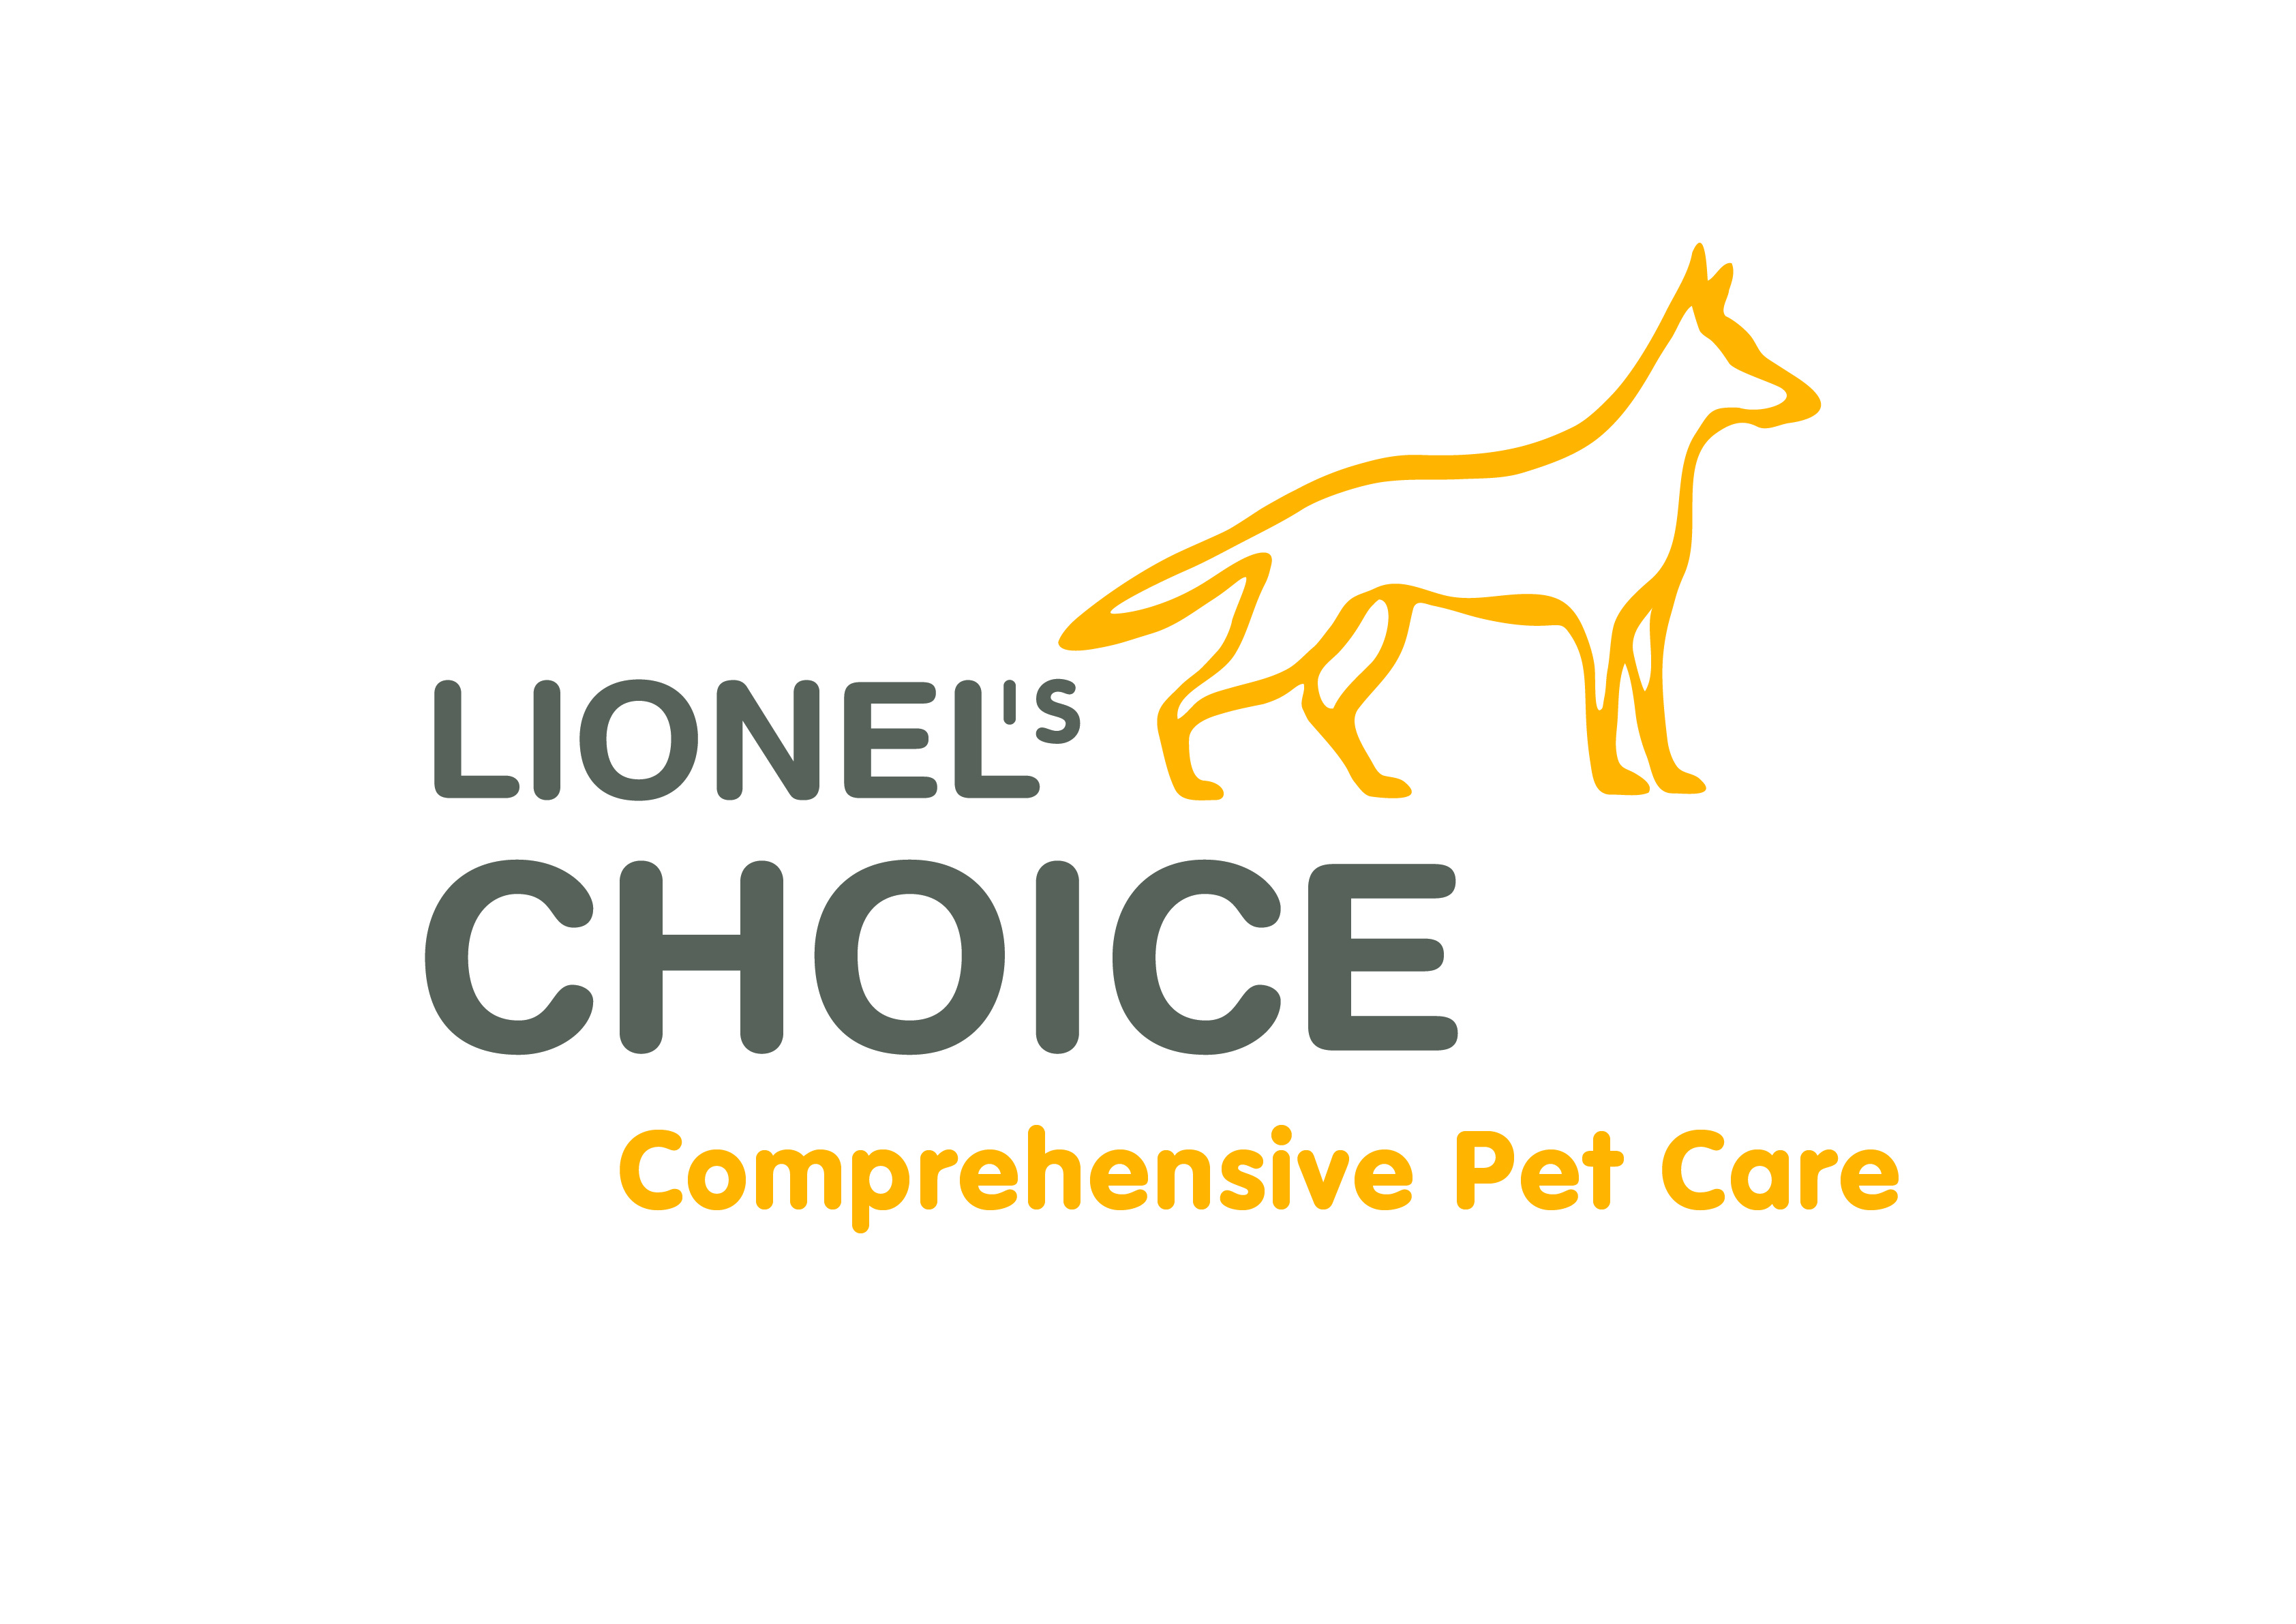 Lionel's Choice